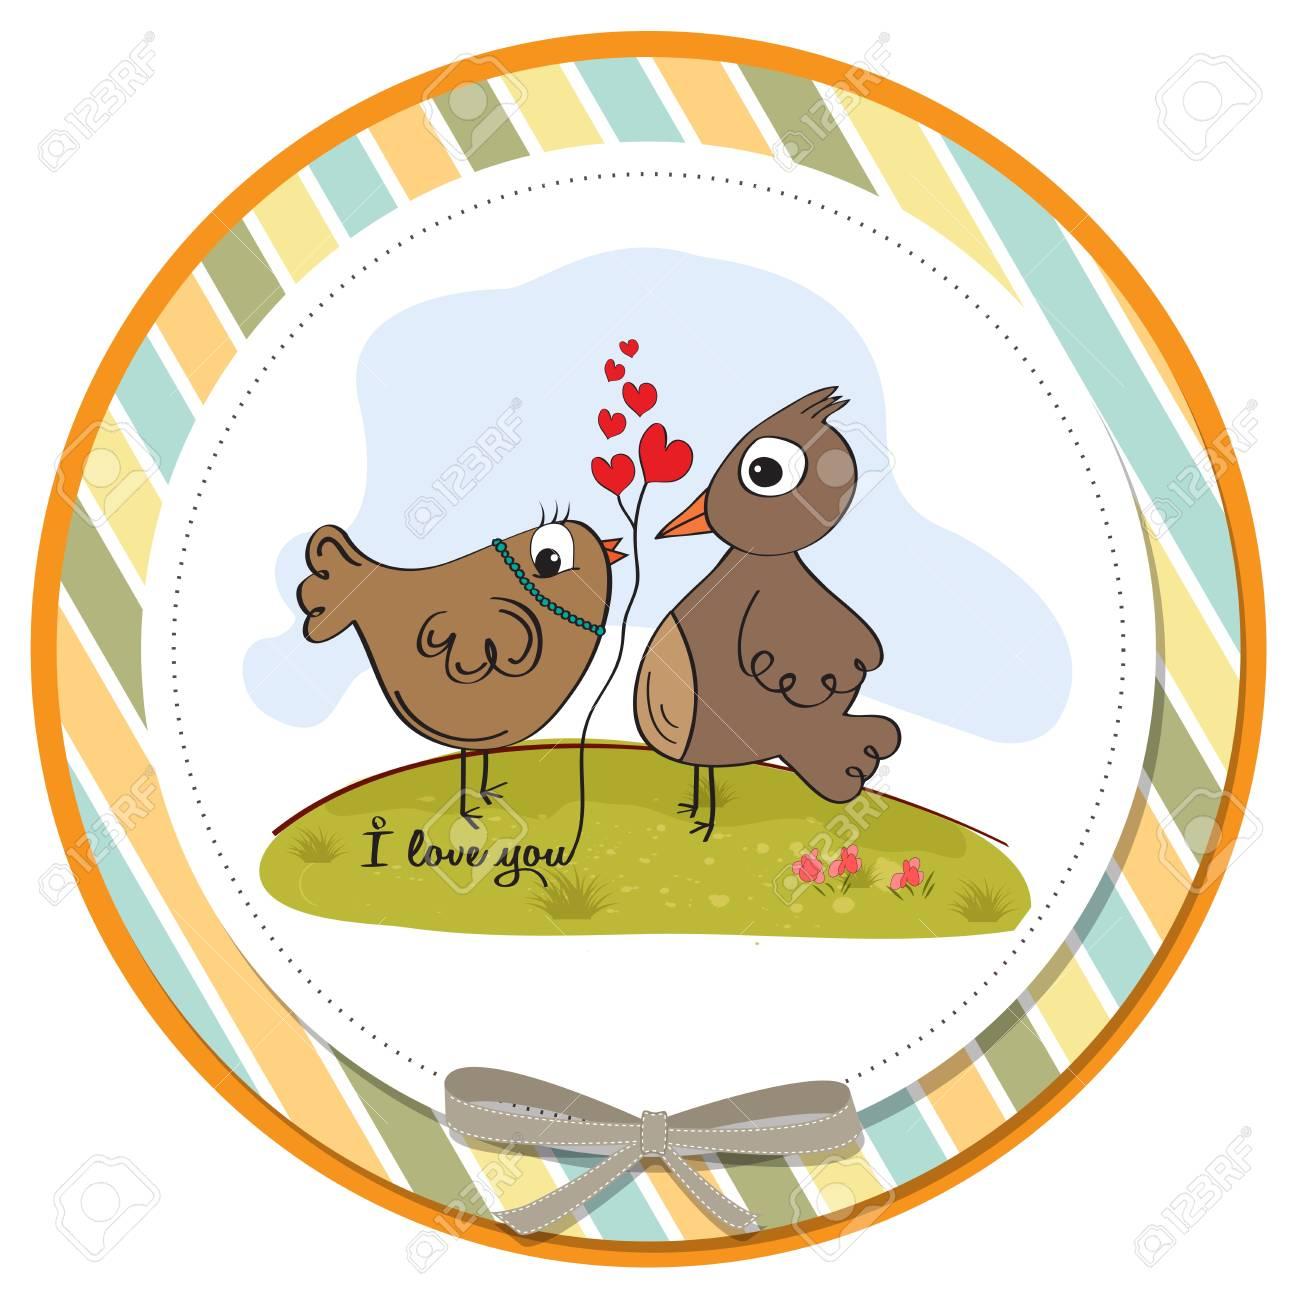 love birds, romantic illustration Stock Vector - 17671744